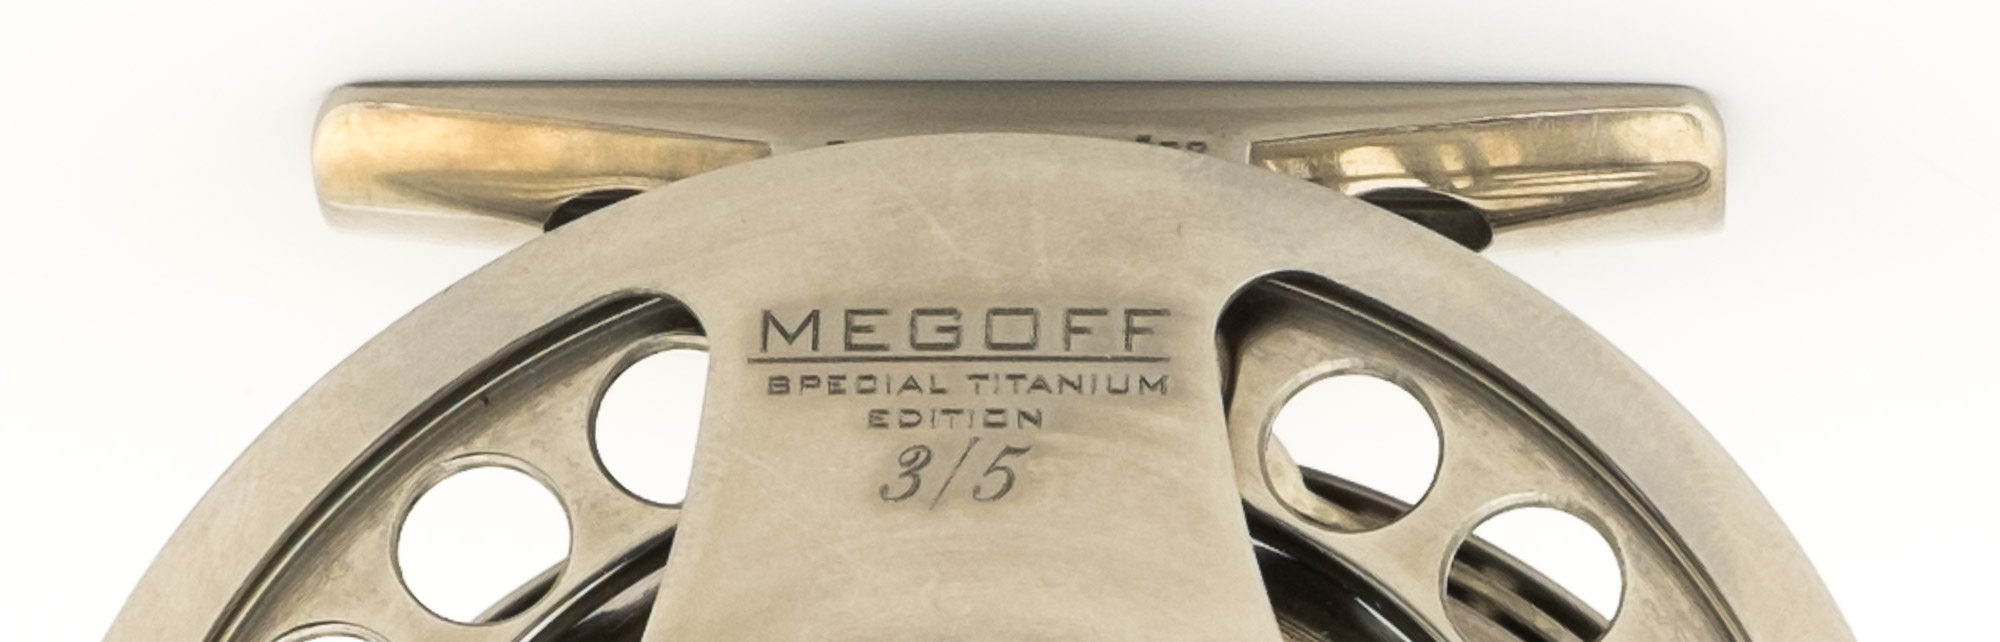 MegoffMDS35DDLATitanium-8